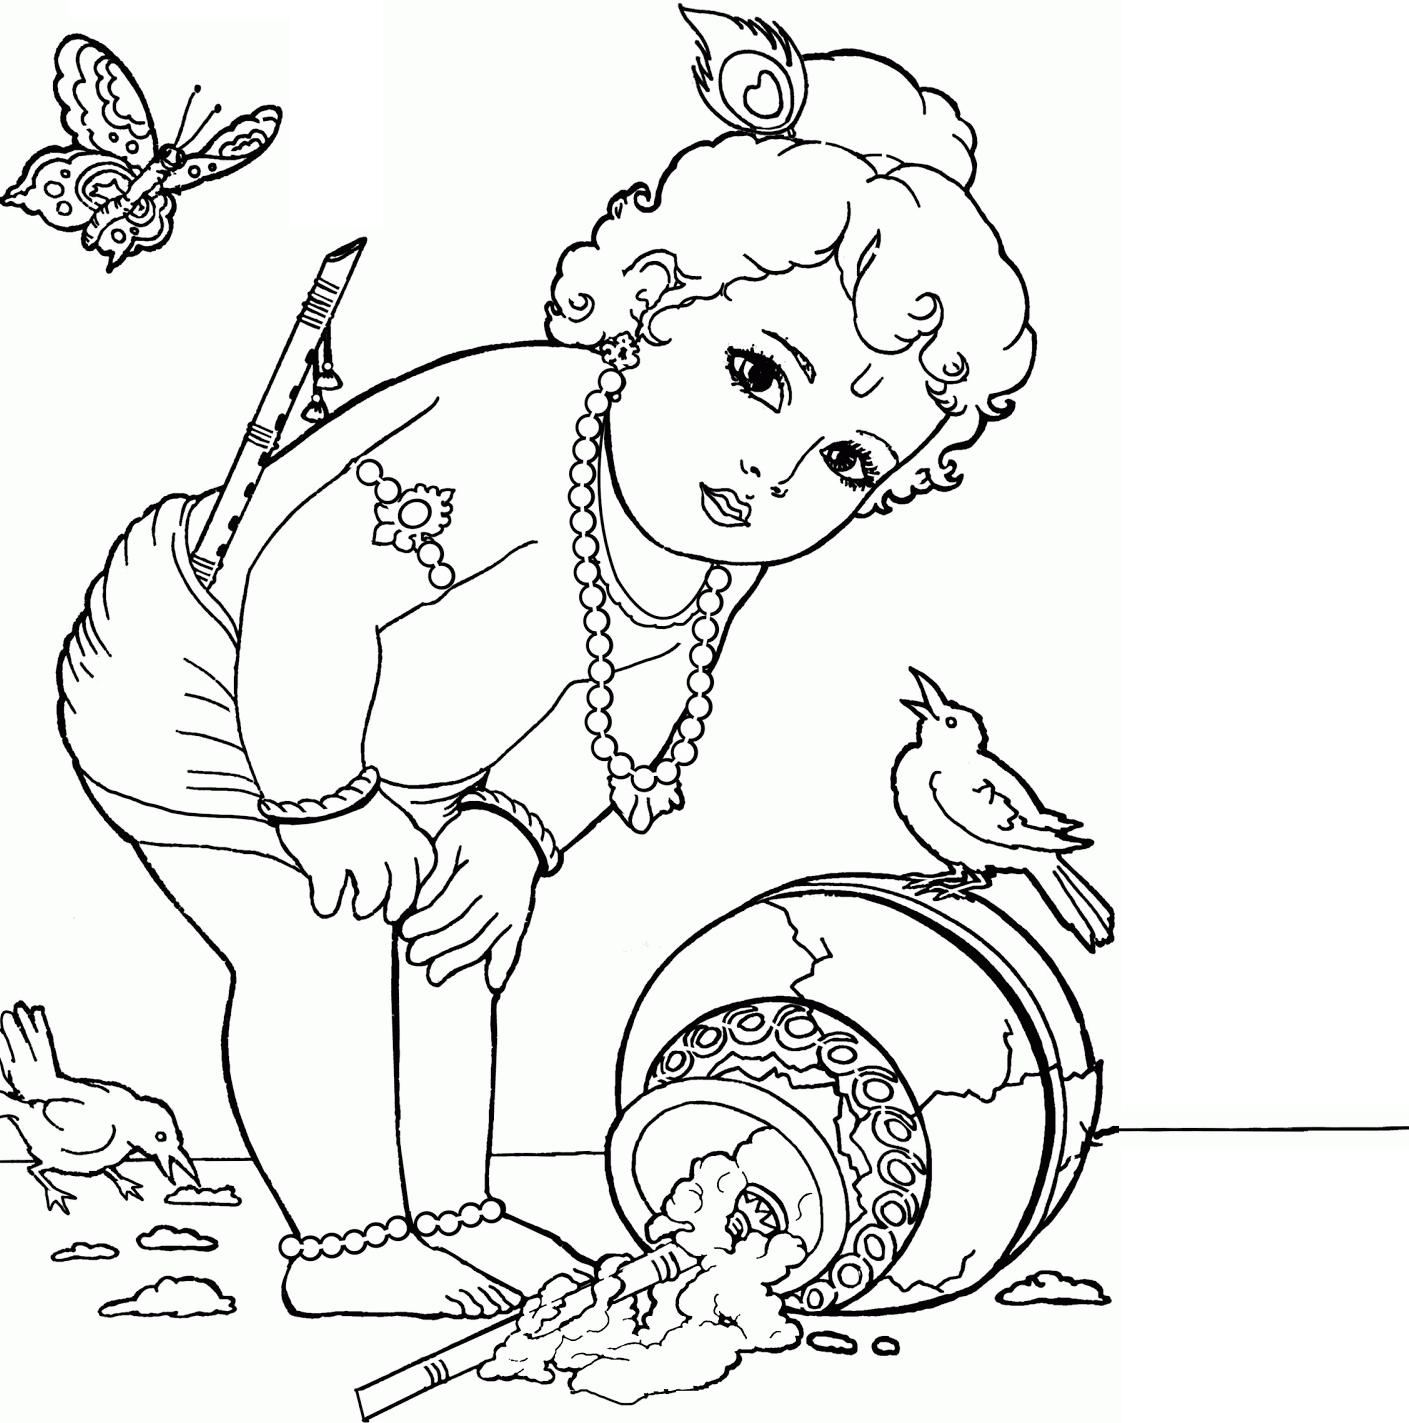 1409x1423 Kids Sketch Drawings Simple Drawings Of Lord Krishna Lord Krishna